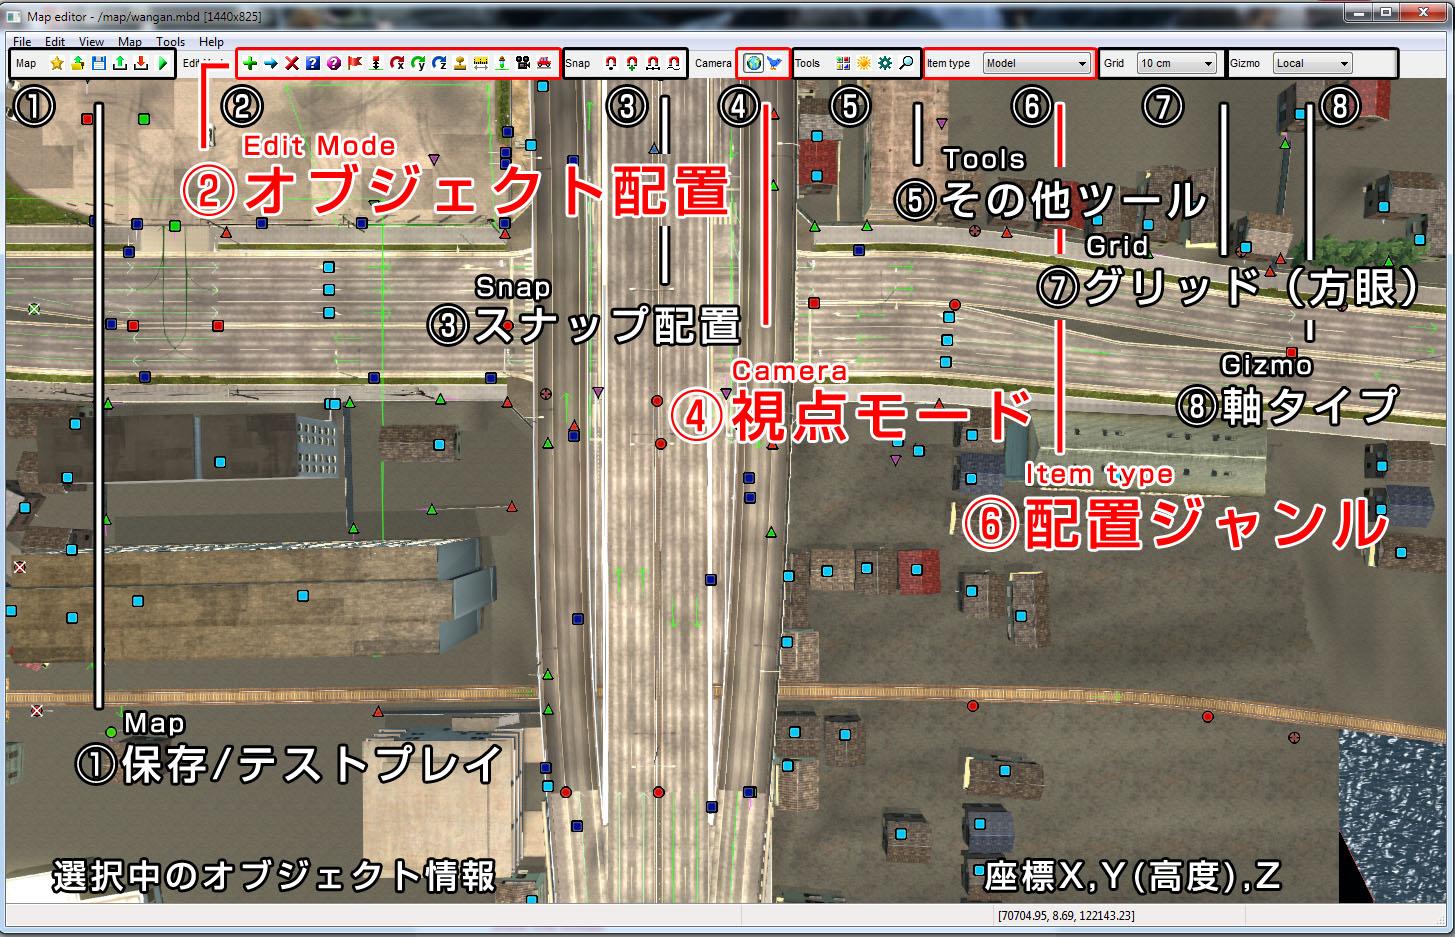 MapEditorチュートリアル - ETS2交流 Wiki*